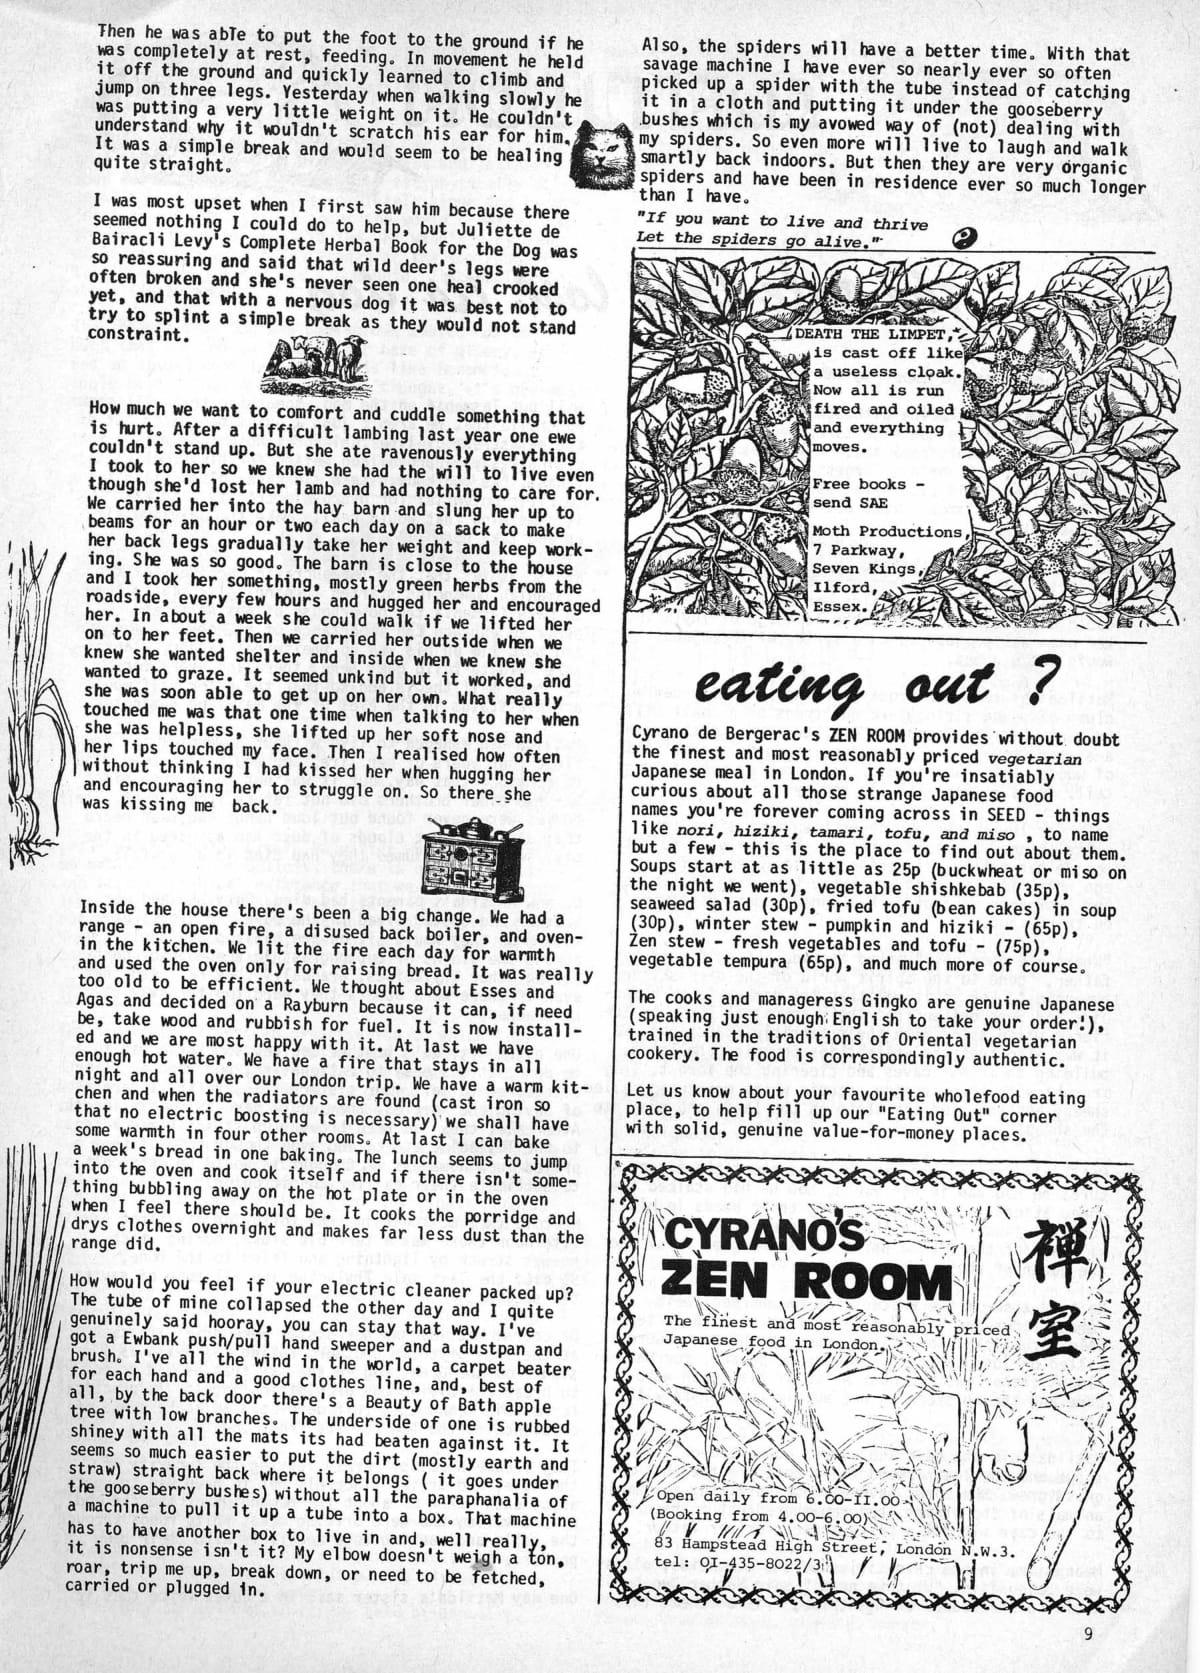 seed-v3-n4-april1974-09.jpg